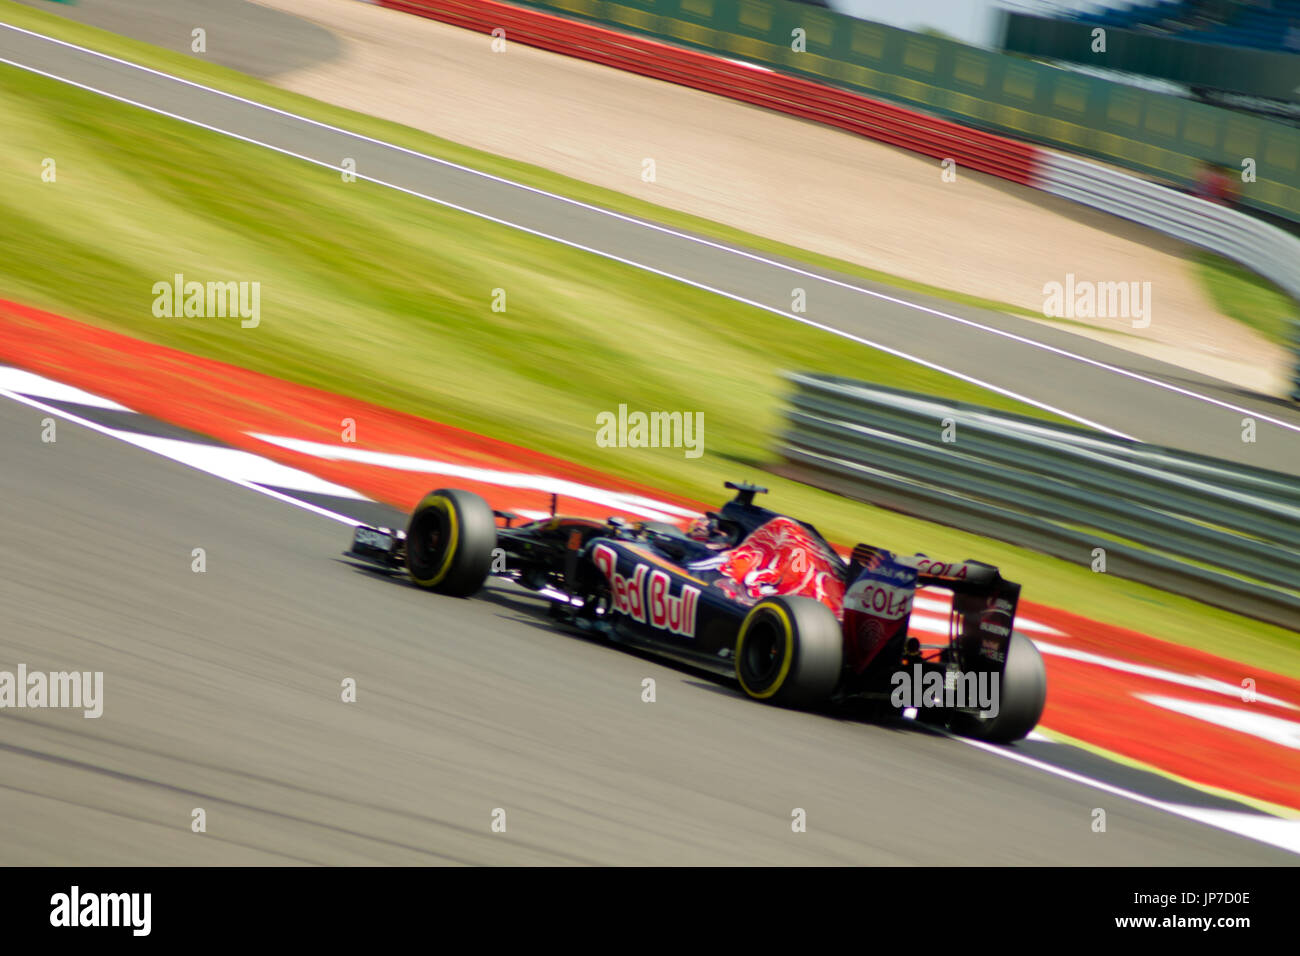 Silverstone grand prix circuit stock photos silverstone - Prix silestone ...